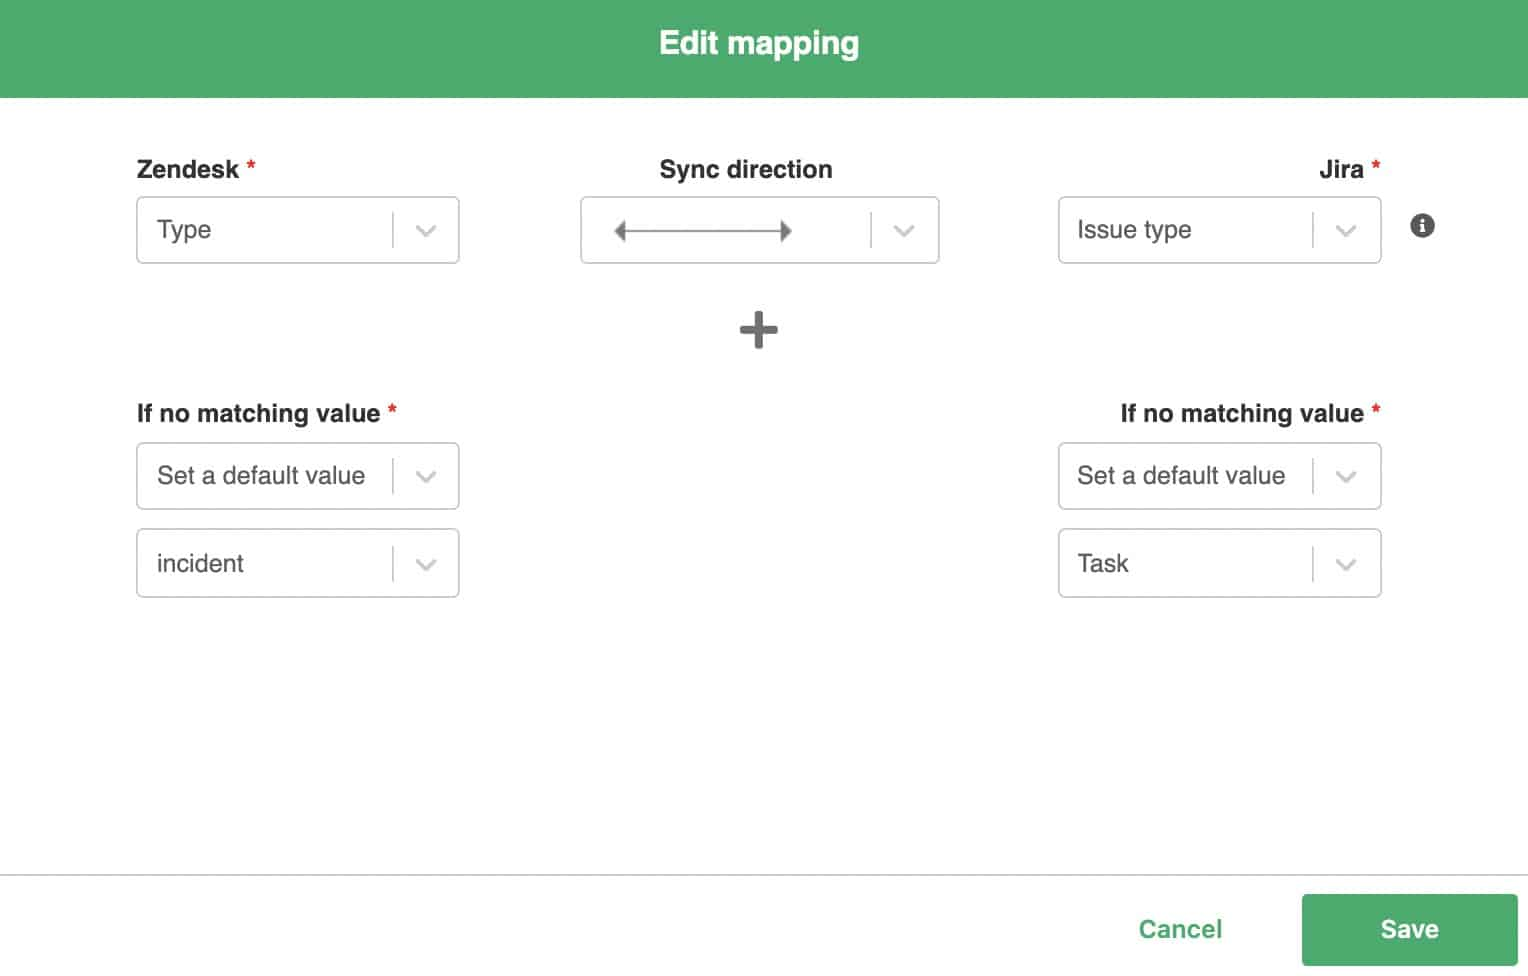 edit jira zendesk mapping